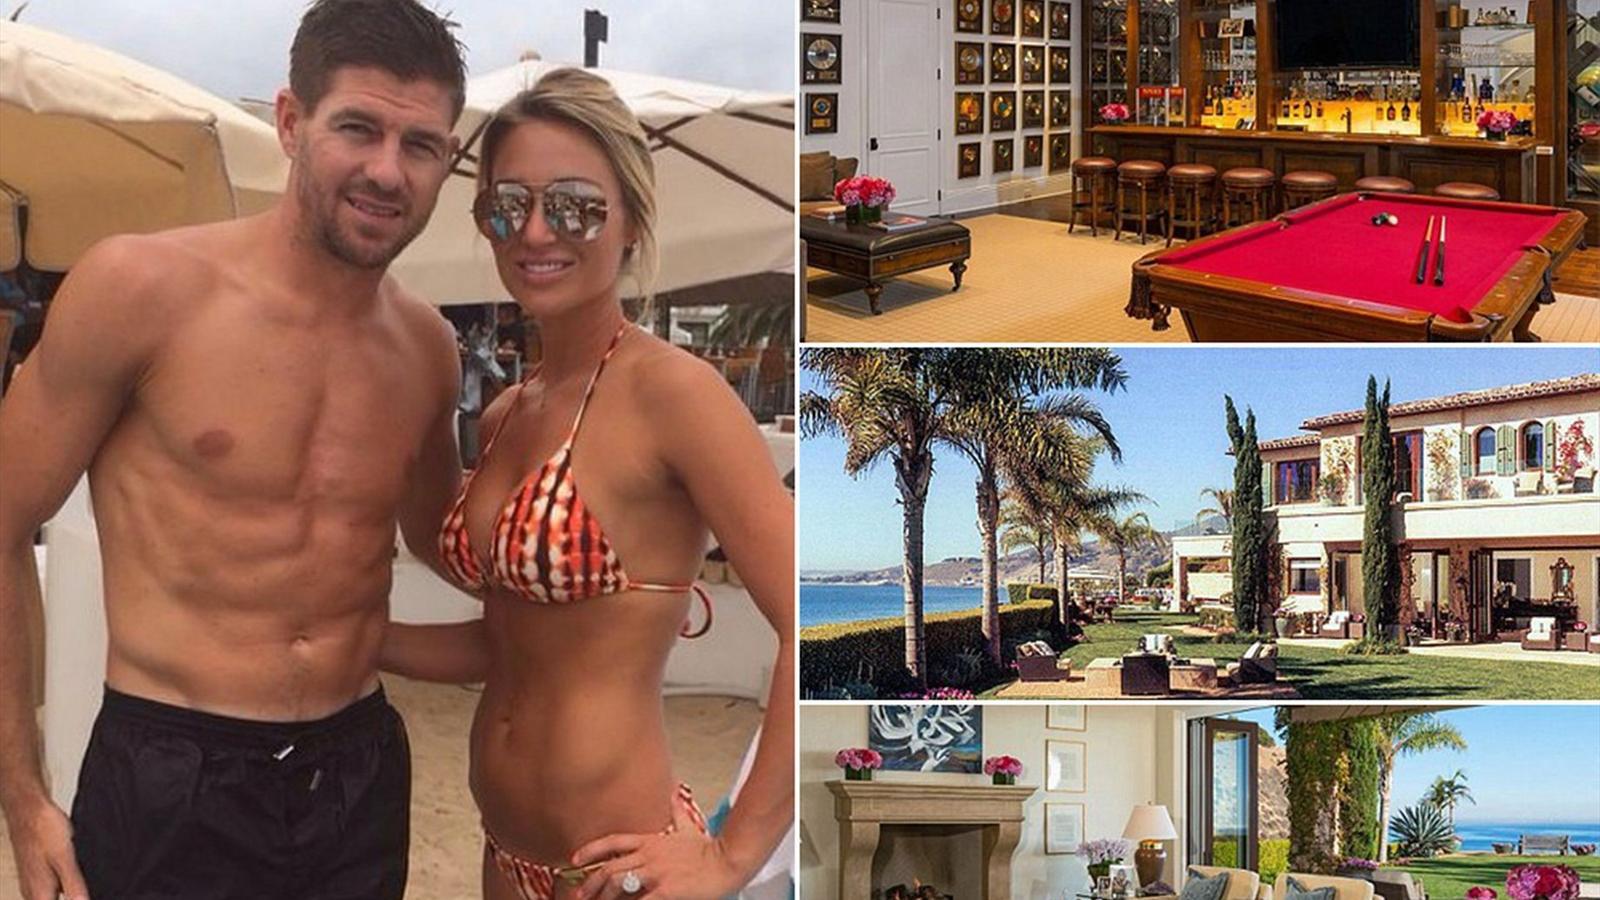 Steven Gerrard's new £16.8m Malibu mansion as midfielder prepares for LA Galaxy switch (Mirror)